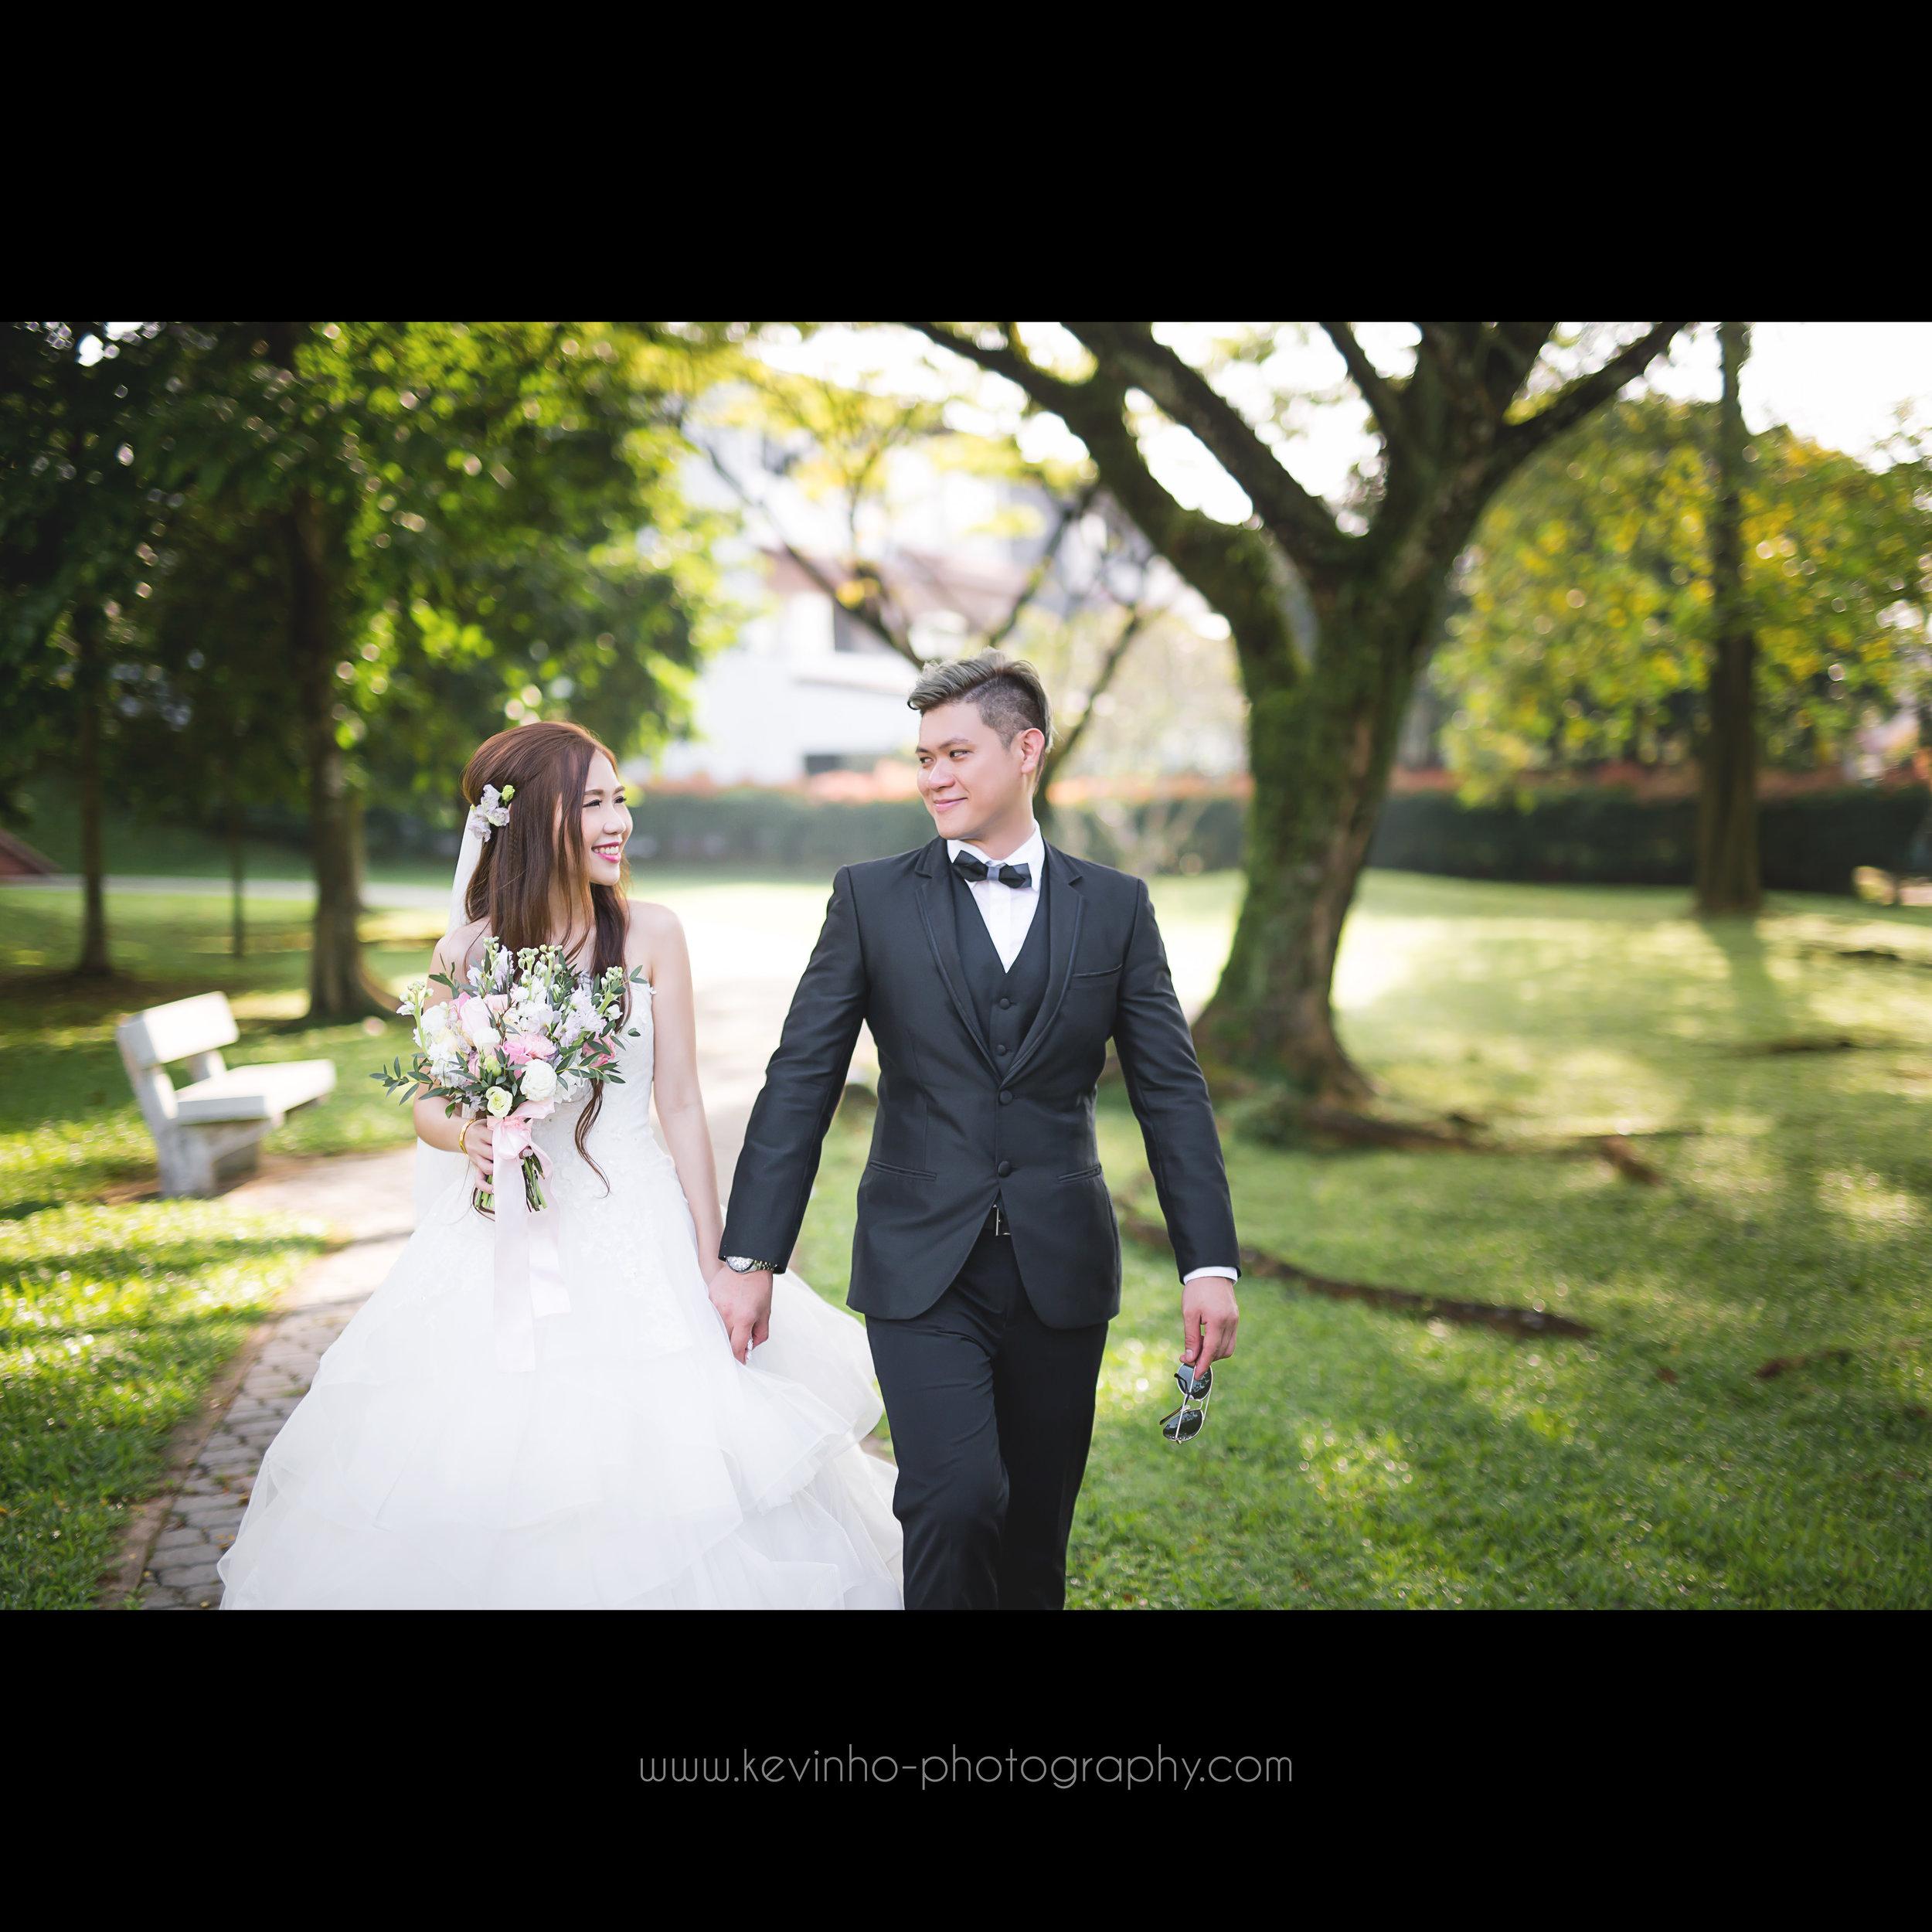 [AWD] Steve & Esther 429-Edit.jpg